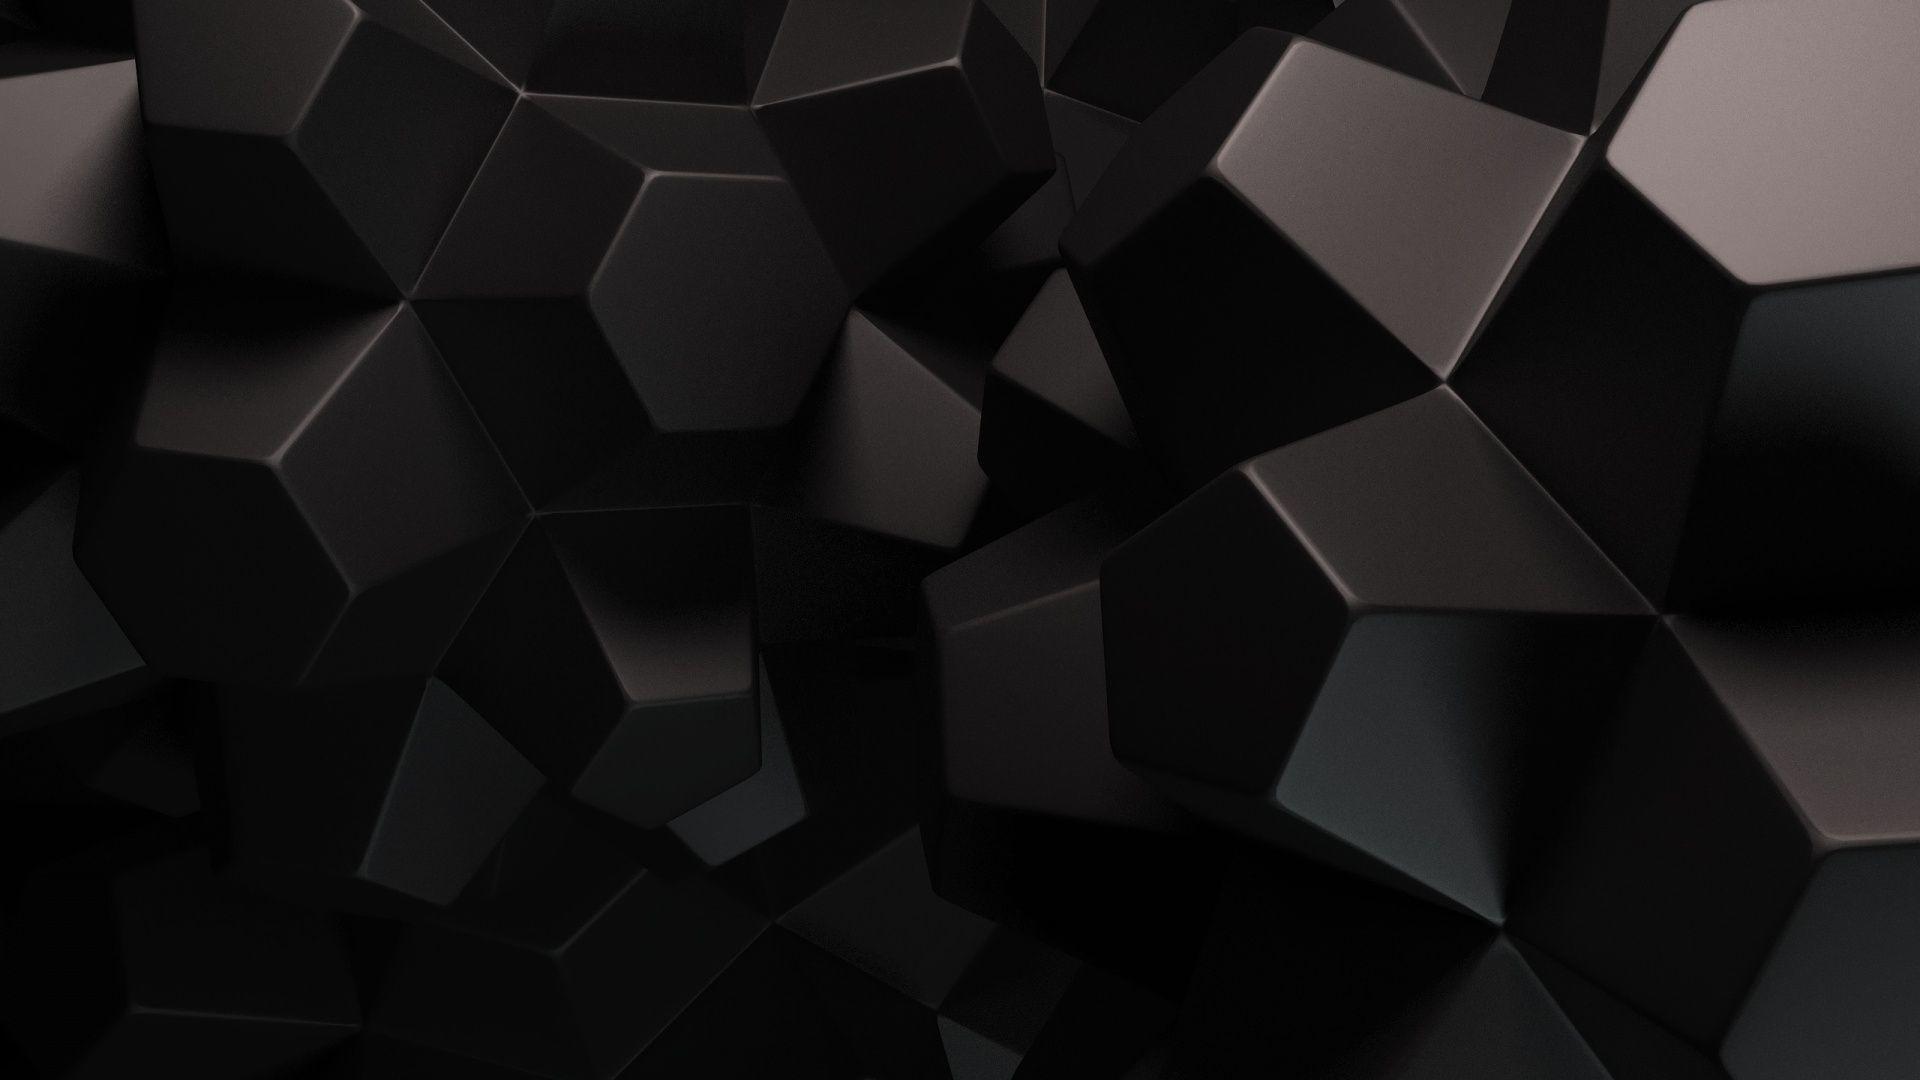 4. black-and-white-wallpaper-border-HD3-600×338